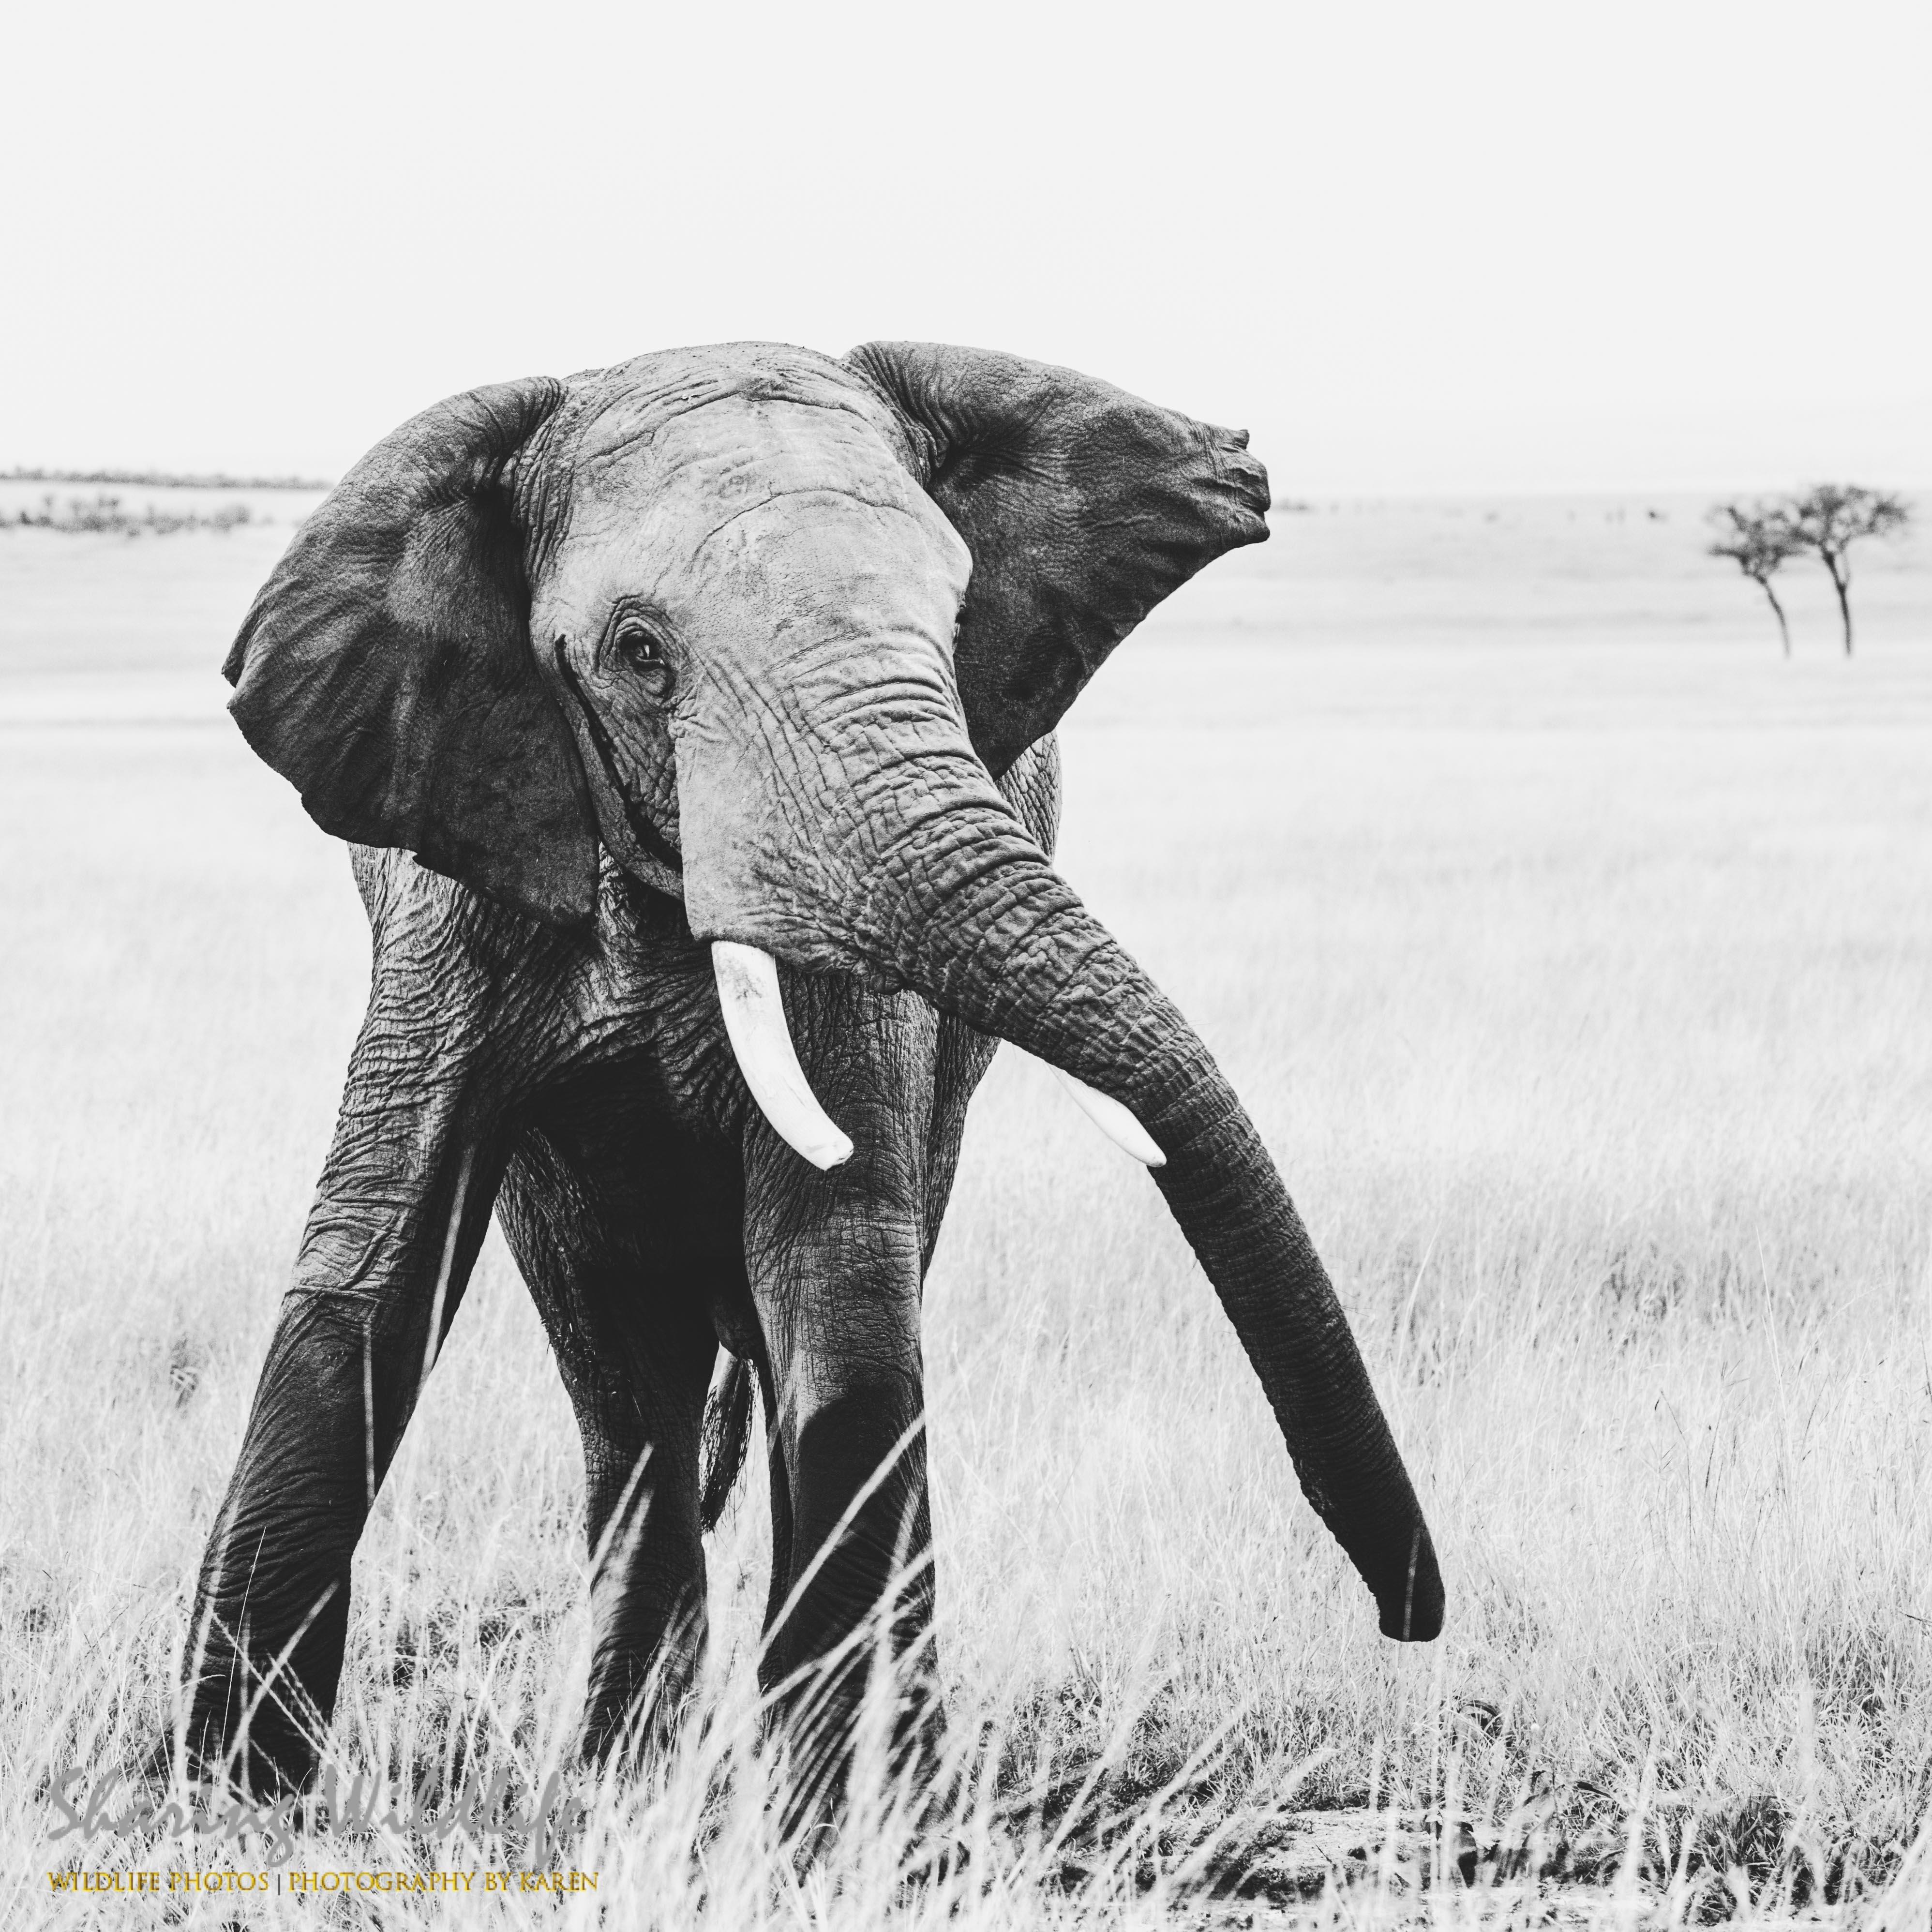 Daning Elephant